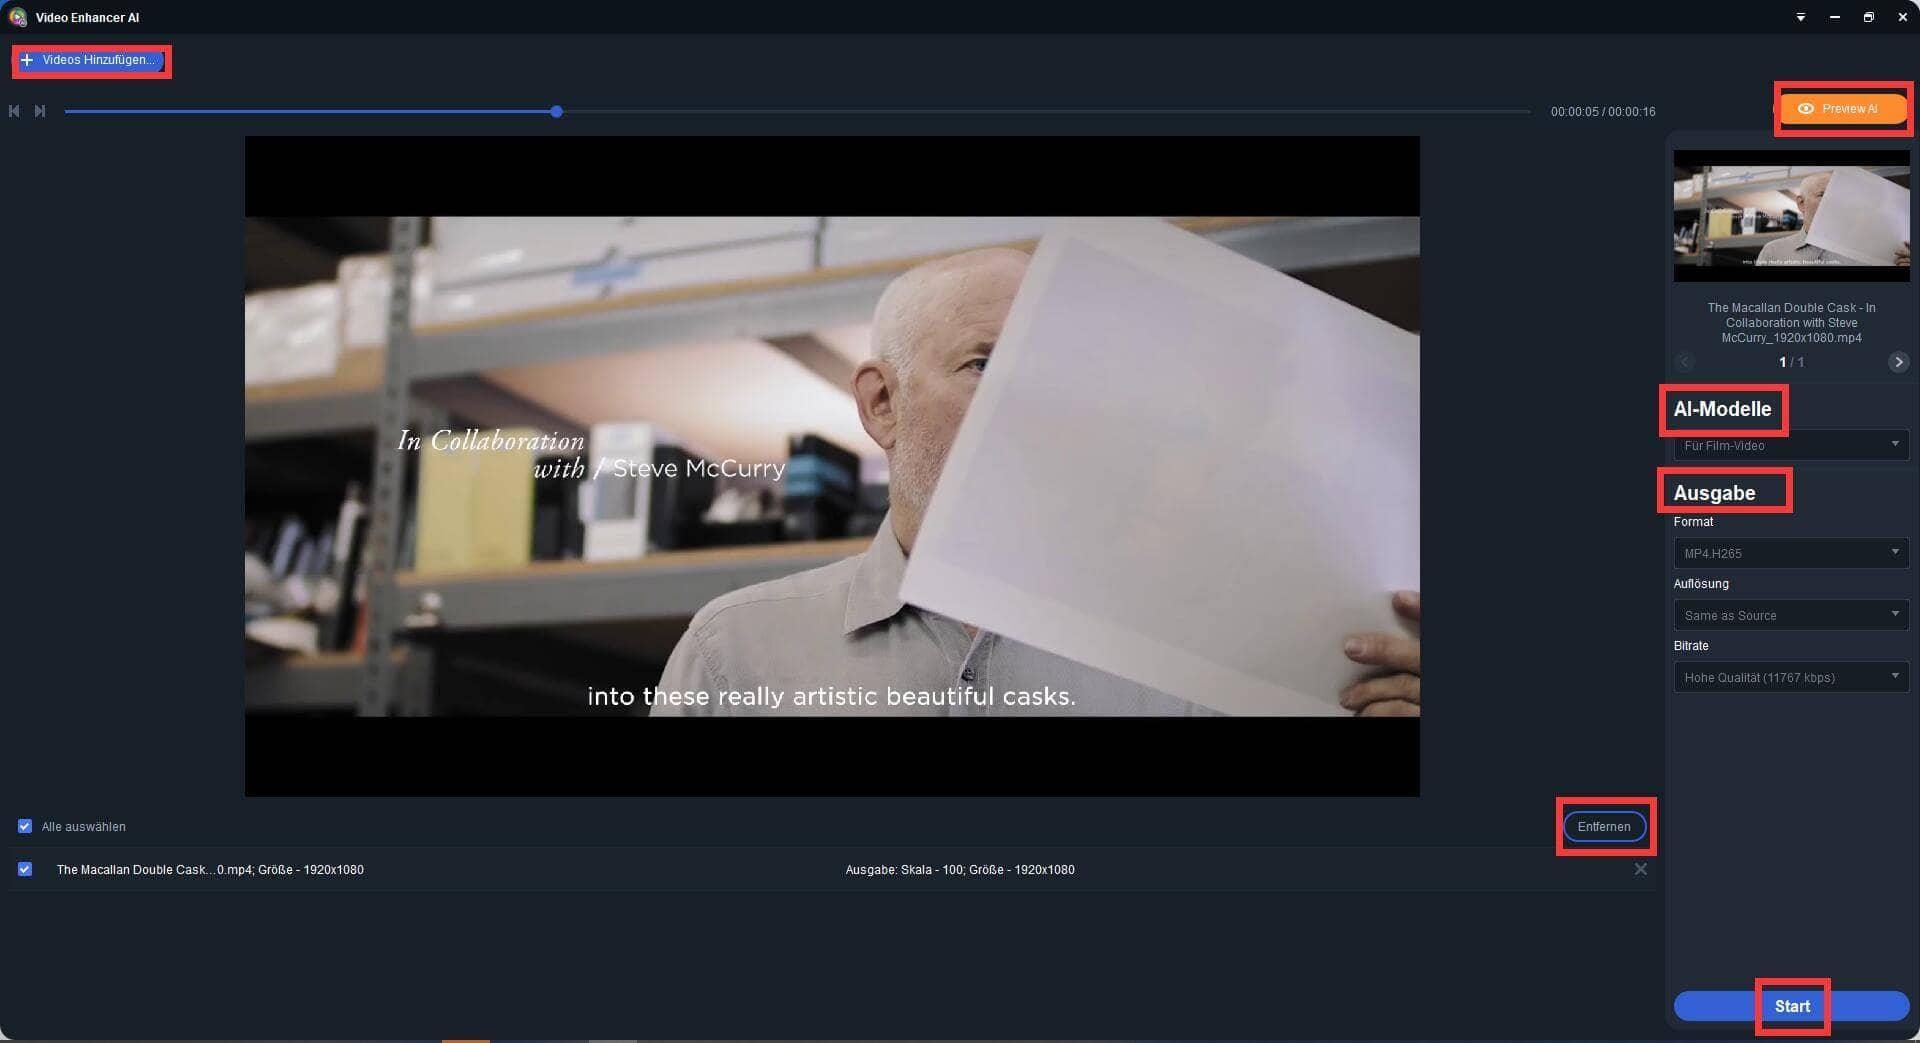 Video Enhancer AI Anleitung 2